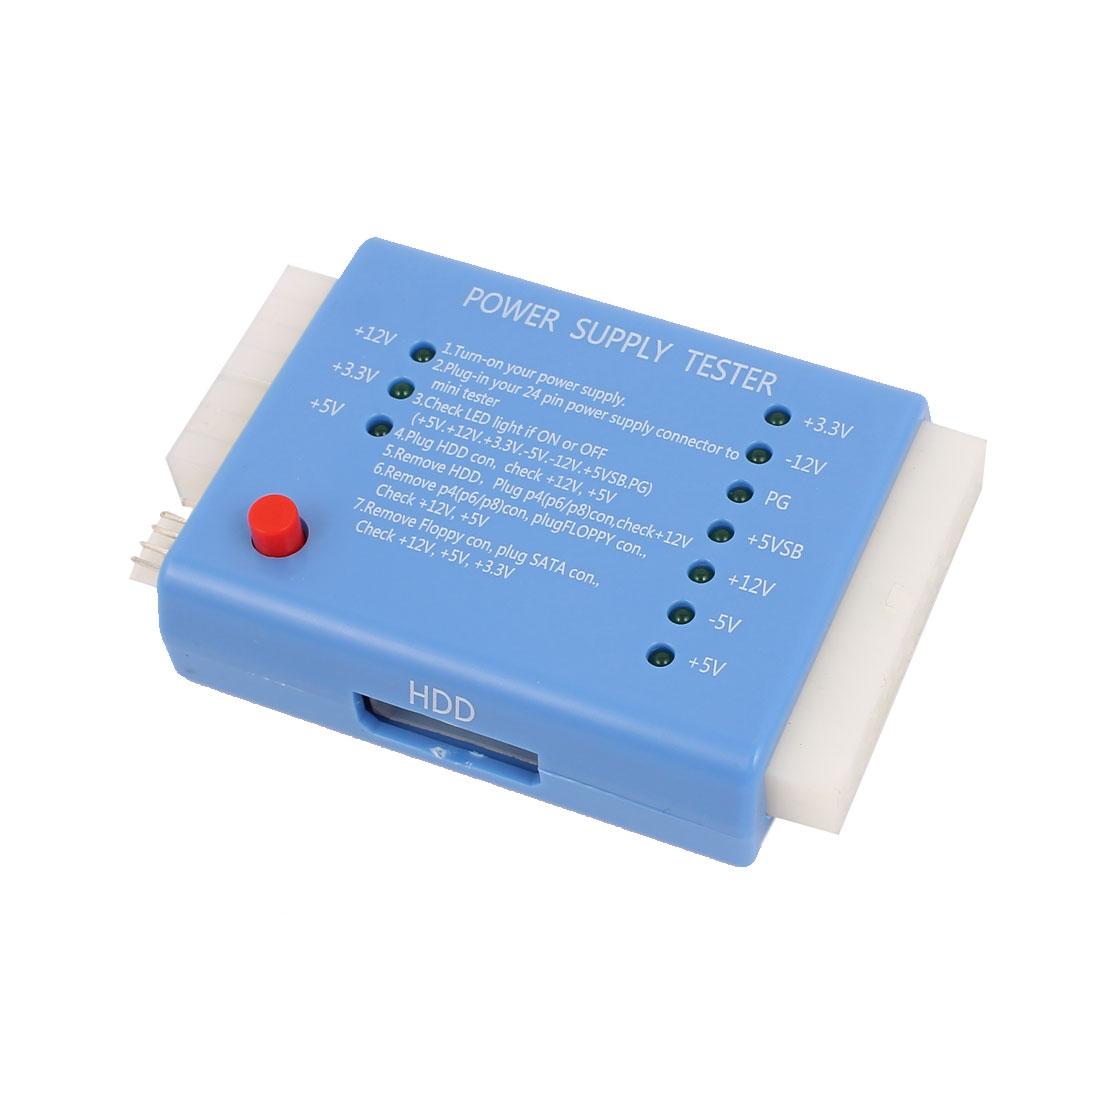 20/24 Pin PC ITX ATX BTX SATA Computer Switch Control Power Supply Tester Blue